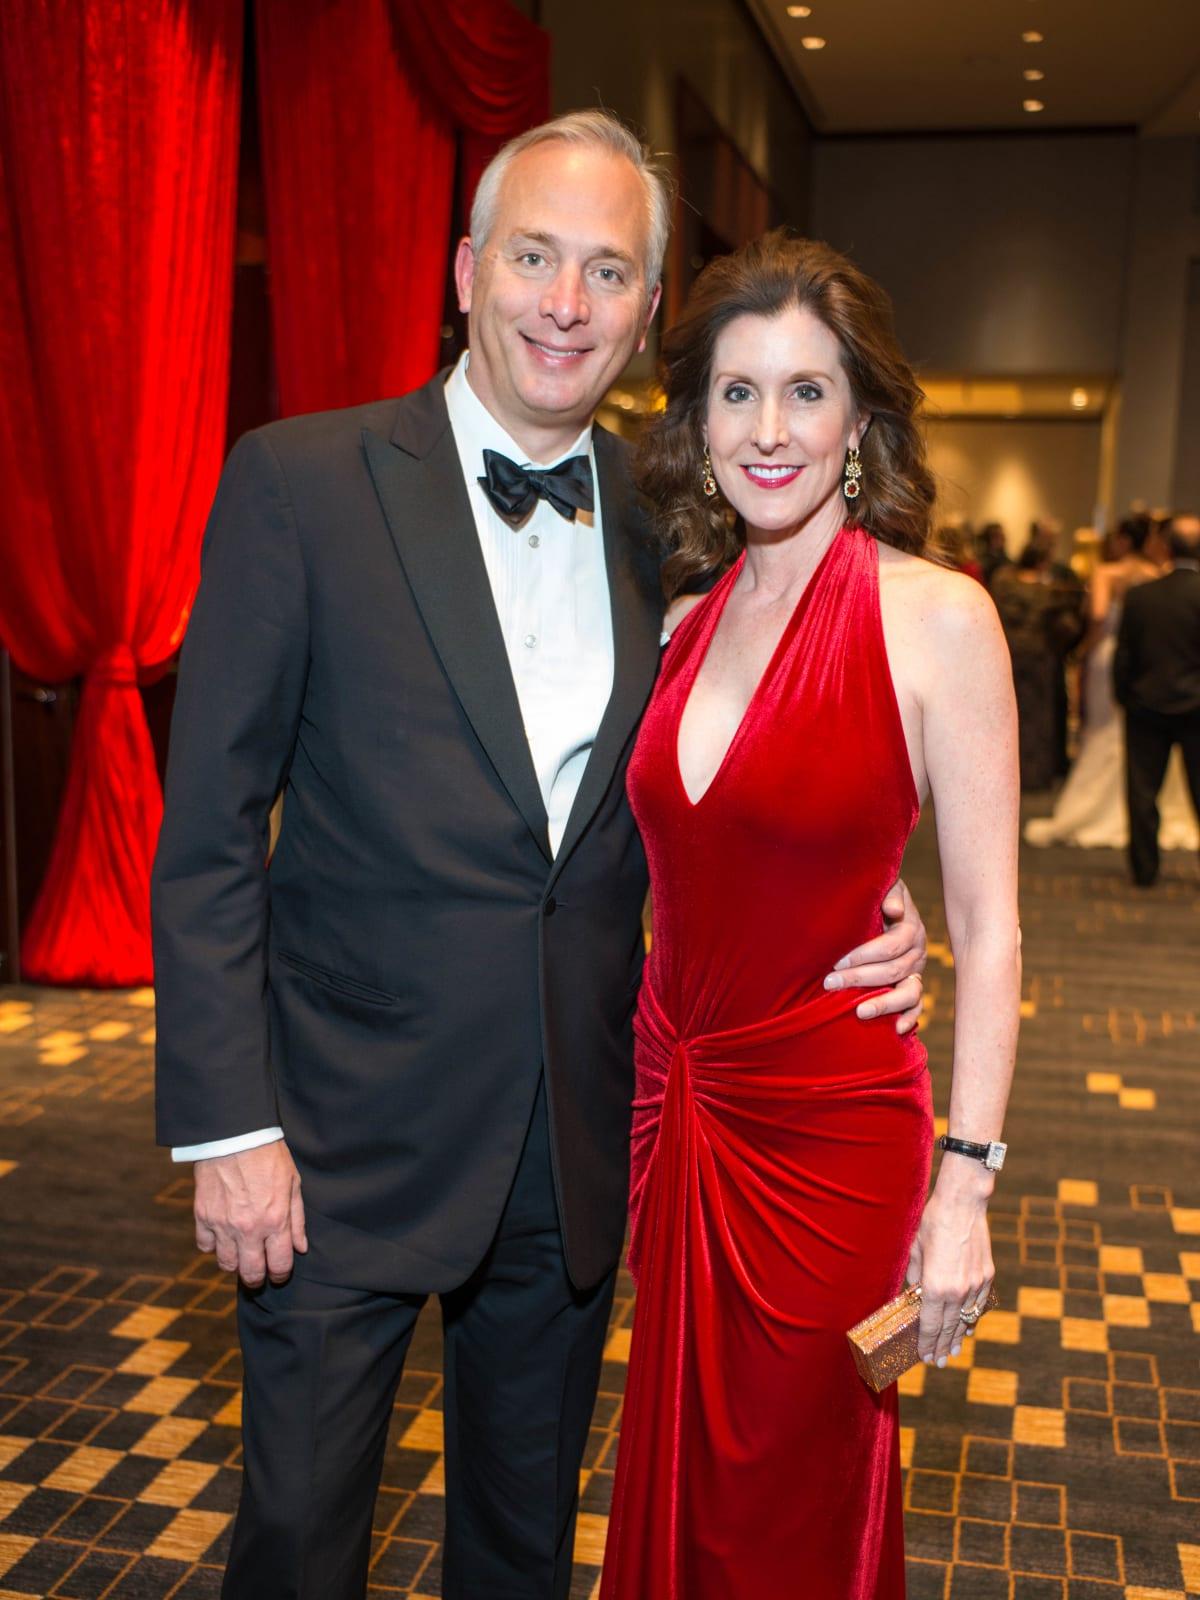 Red Cross Ball, Feb. 2016, Bobby Tudor, Phoebe Tudor